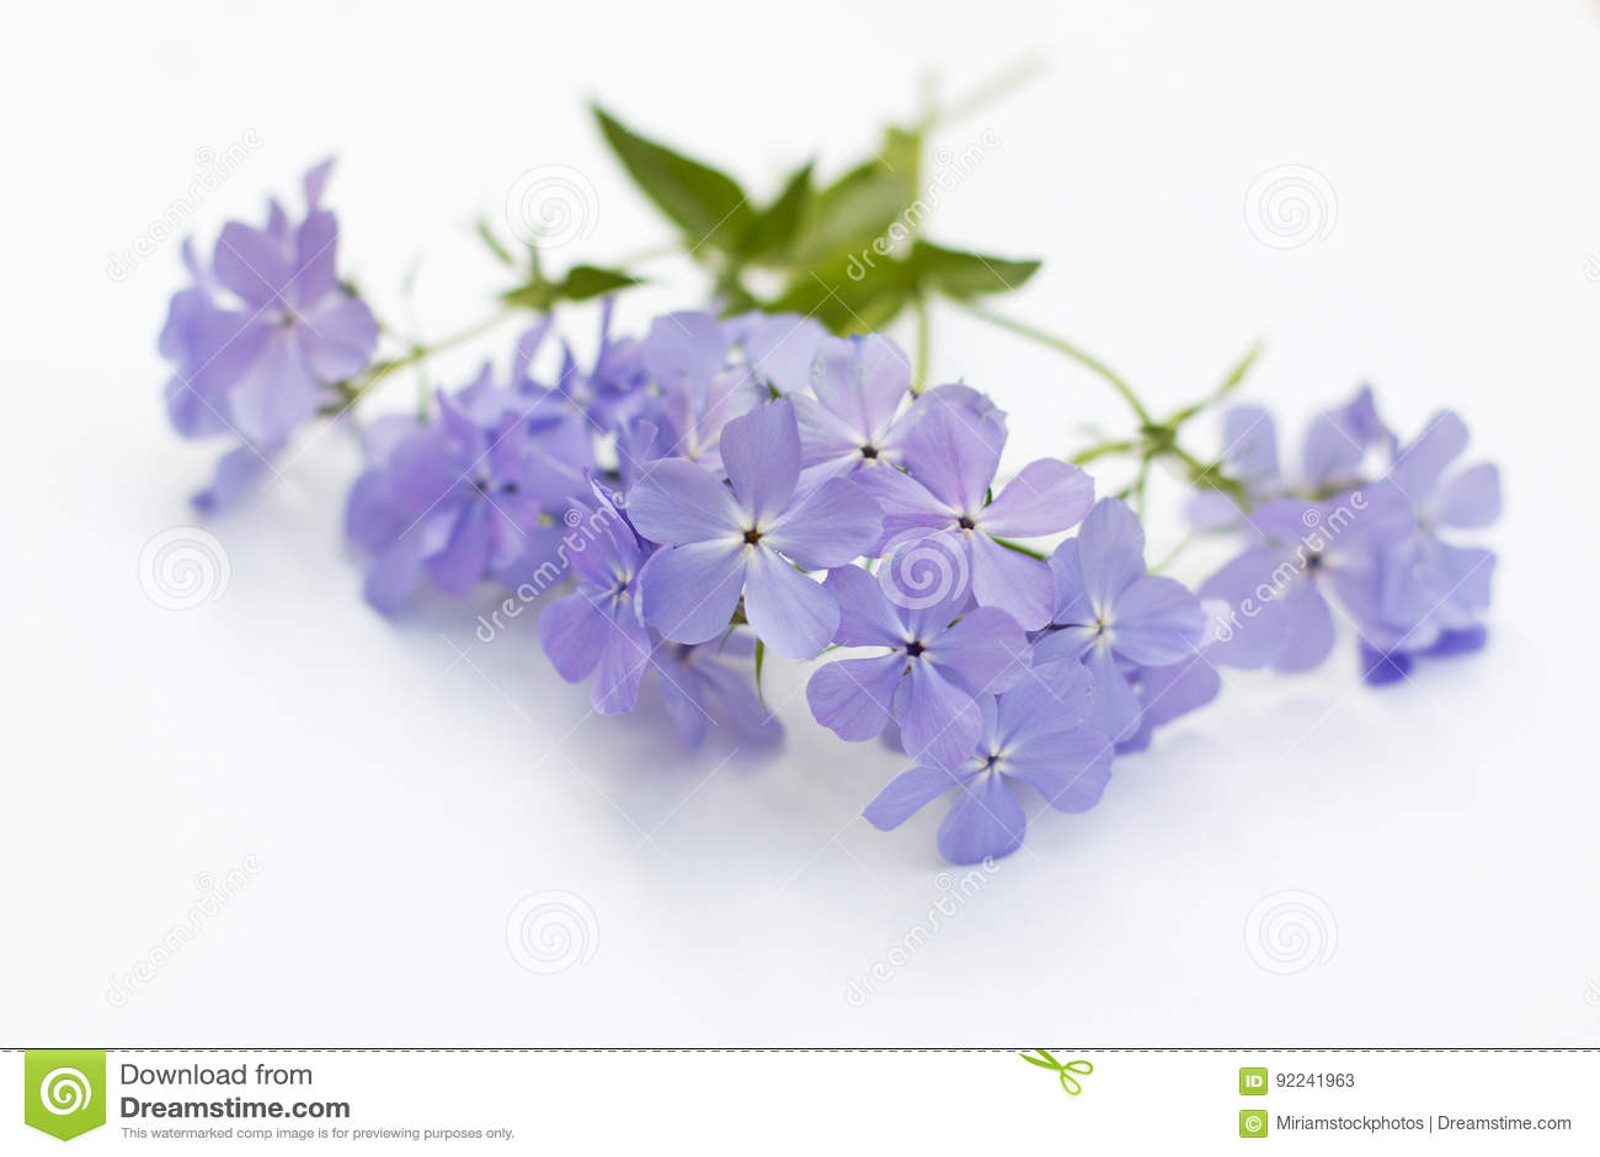 Phlox Blue Moon Flowers On White Background Stock Image Image Of